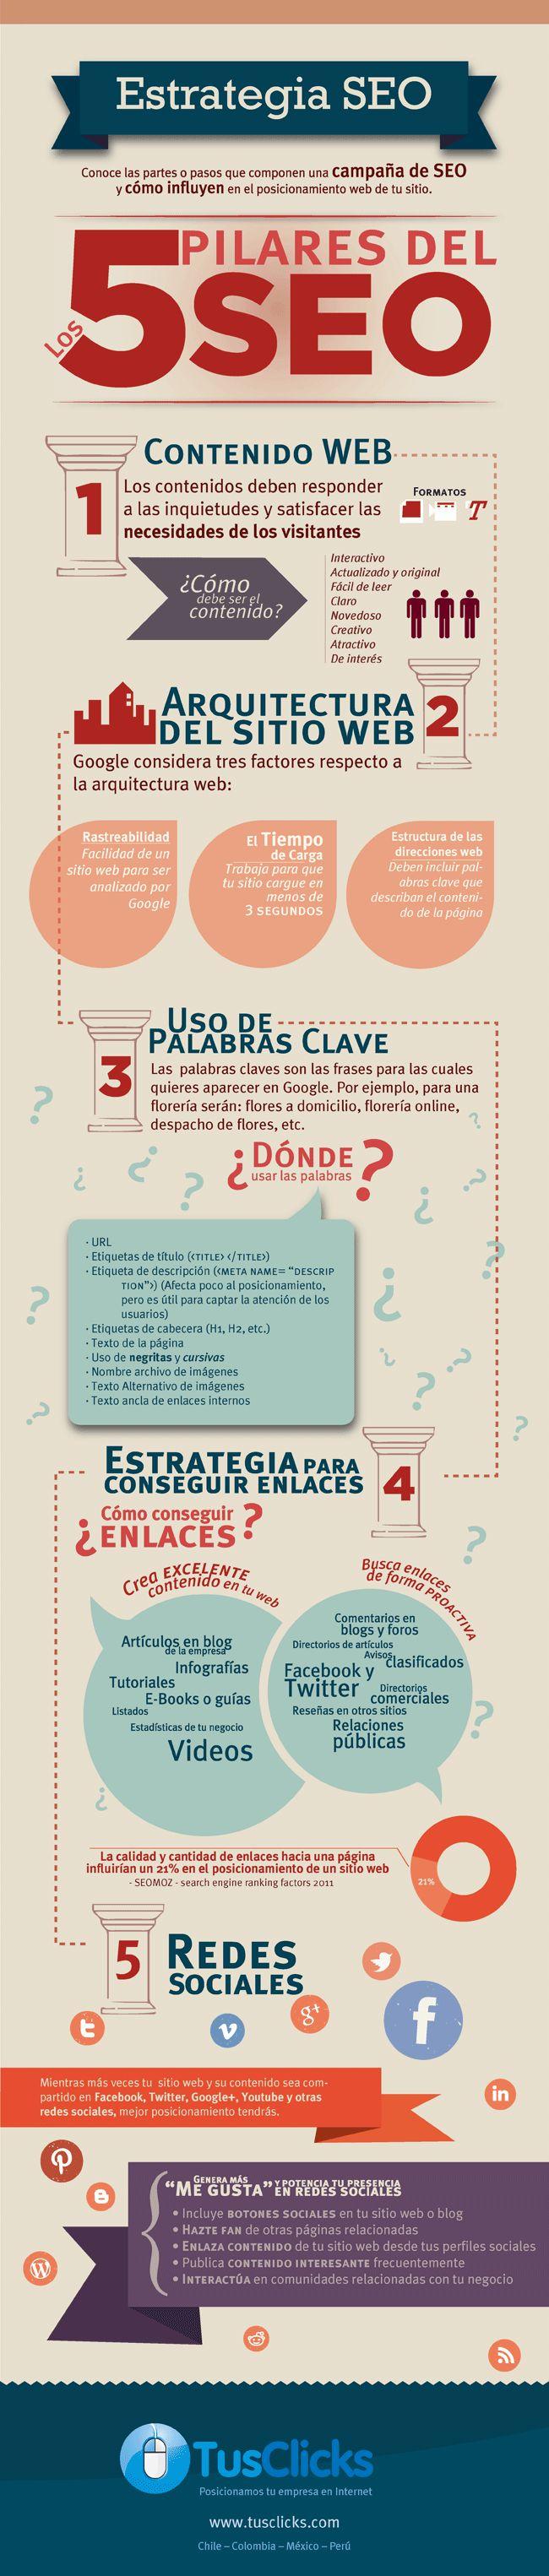 Los 5 pilares de SEO #infografia